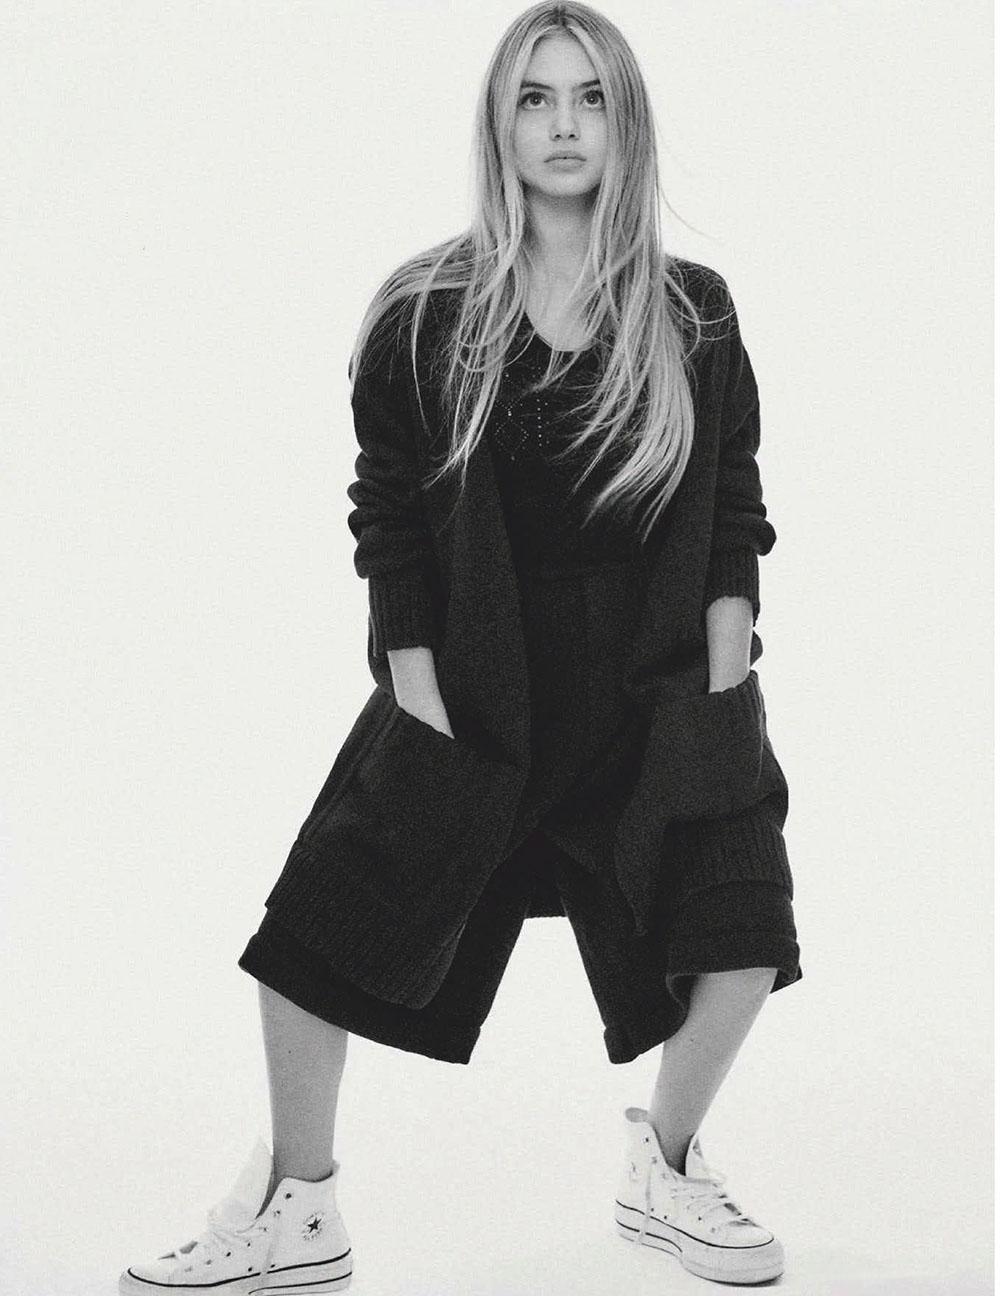 Heidi Klum and Leni Klum cover Vogue Germany January February 2021 by Chris Colls